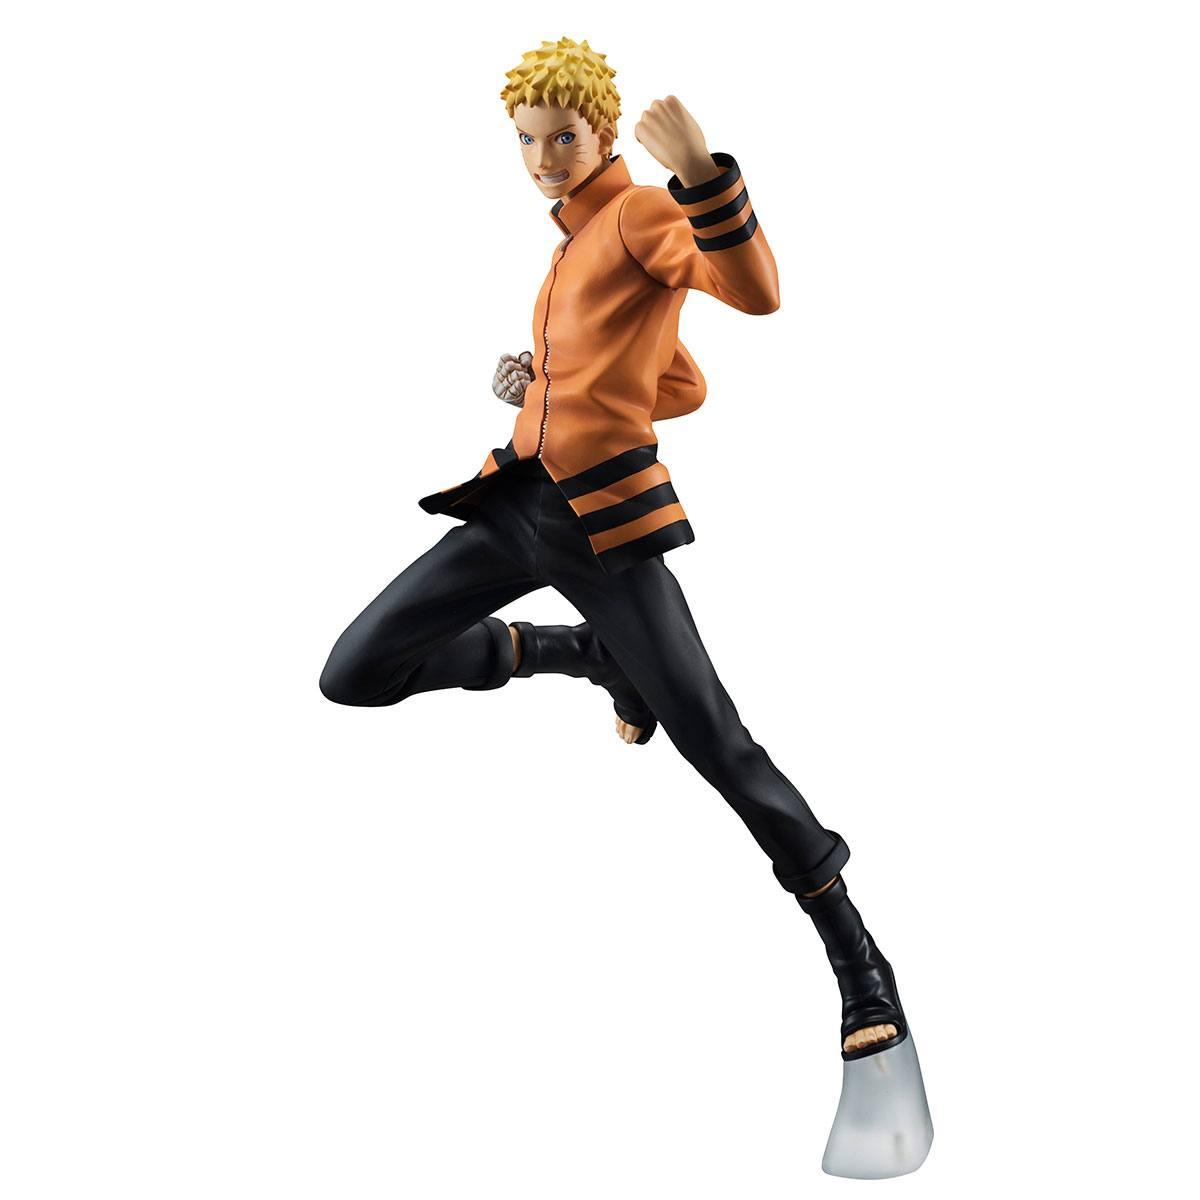 Boruto Naruto Next Generations G.E.M. Series PVC Statue 1/8 Naruto Nanadaime Hokage Ver. 20 cm